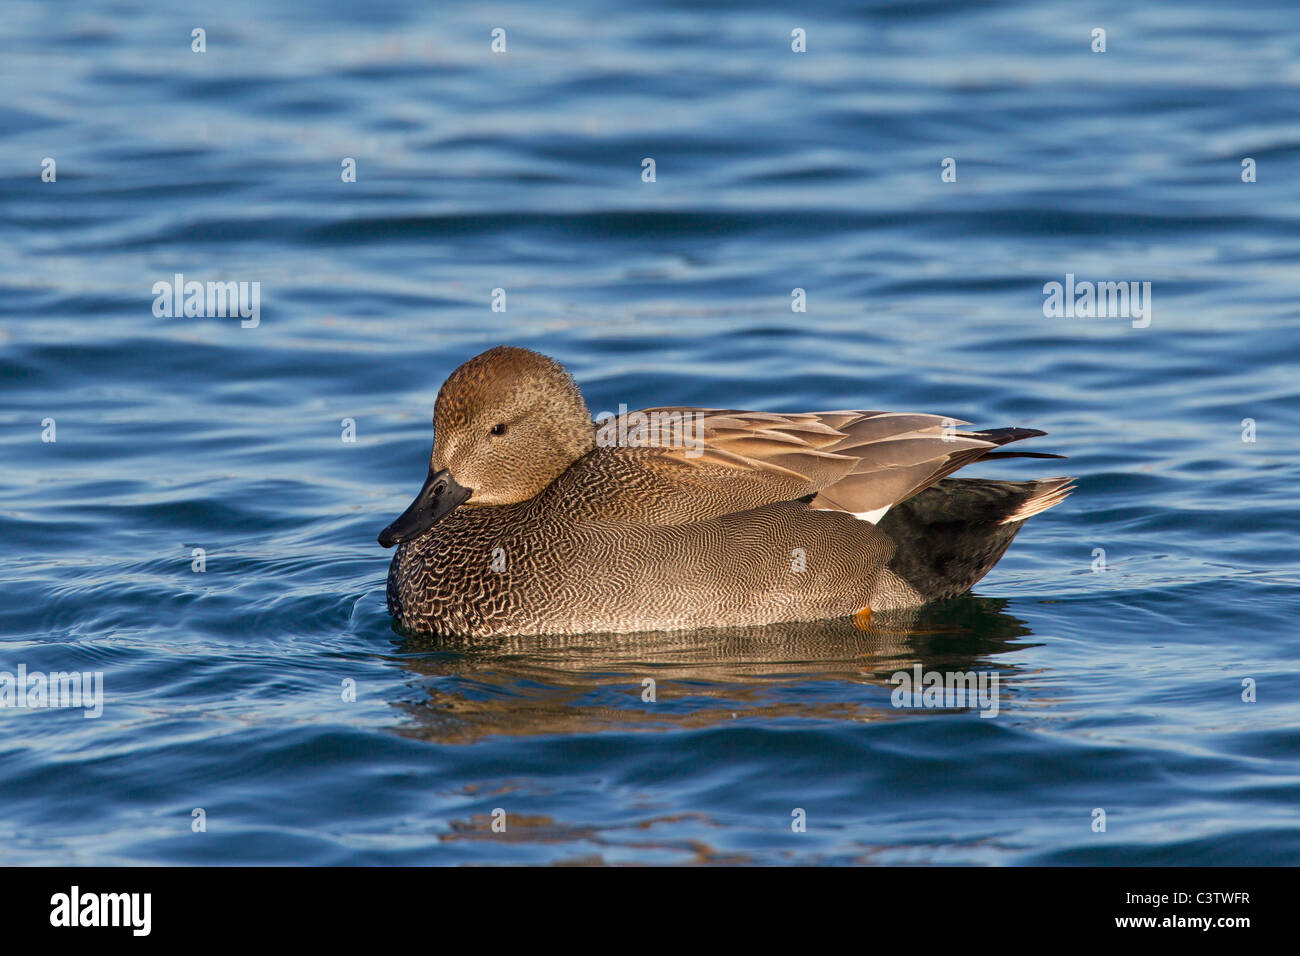 Gadwall (Anas strepera / Mareca strepera) male swimming in lake, Germany - Stock Image